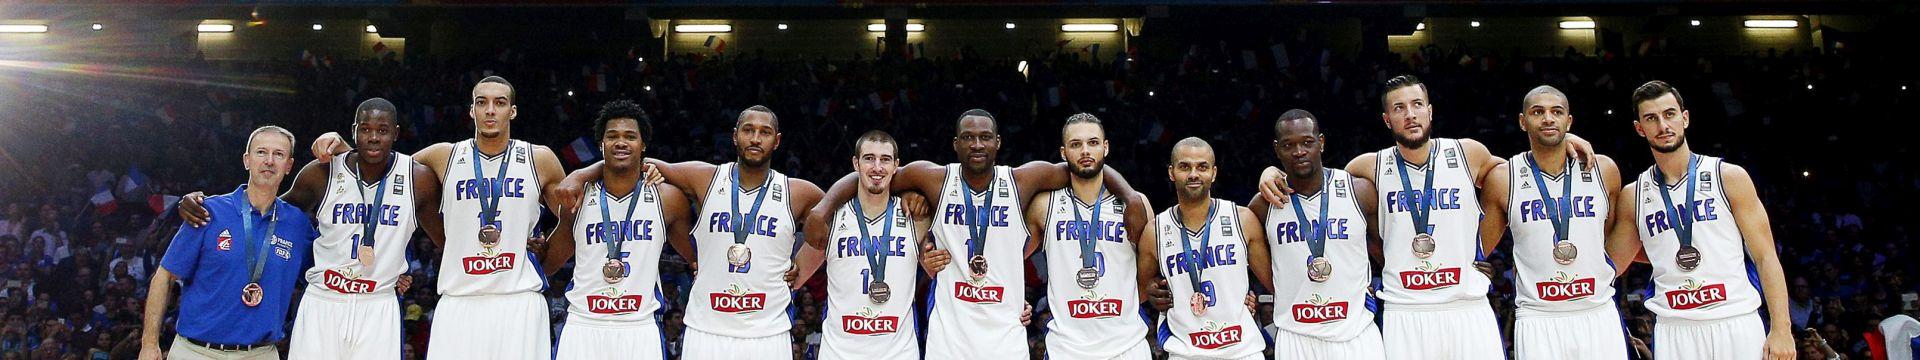 TEODOSIĆ 0/9 IZ IGRE EuroBasket: Francuzi preko Srbije do bronce